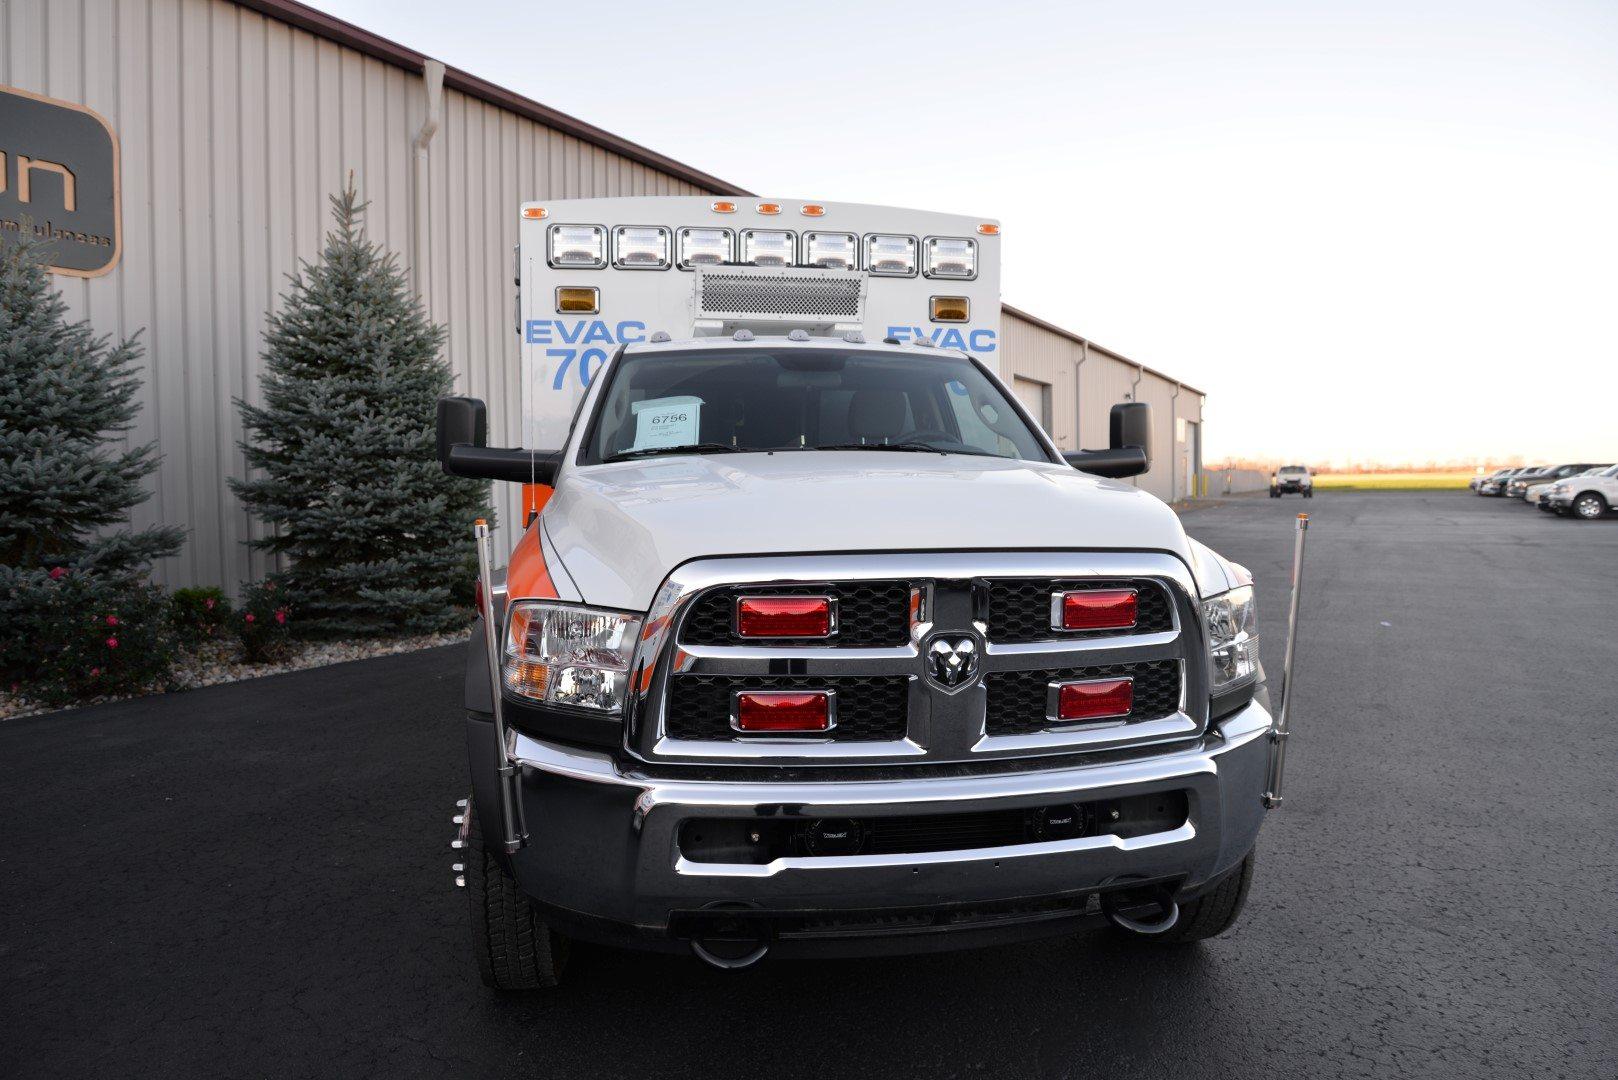 EVAC-Braun-Express-Plus-Ambulance-015